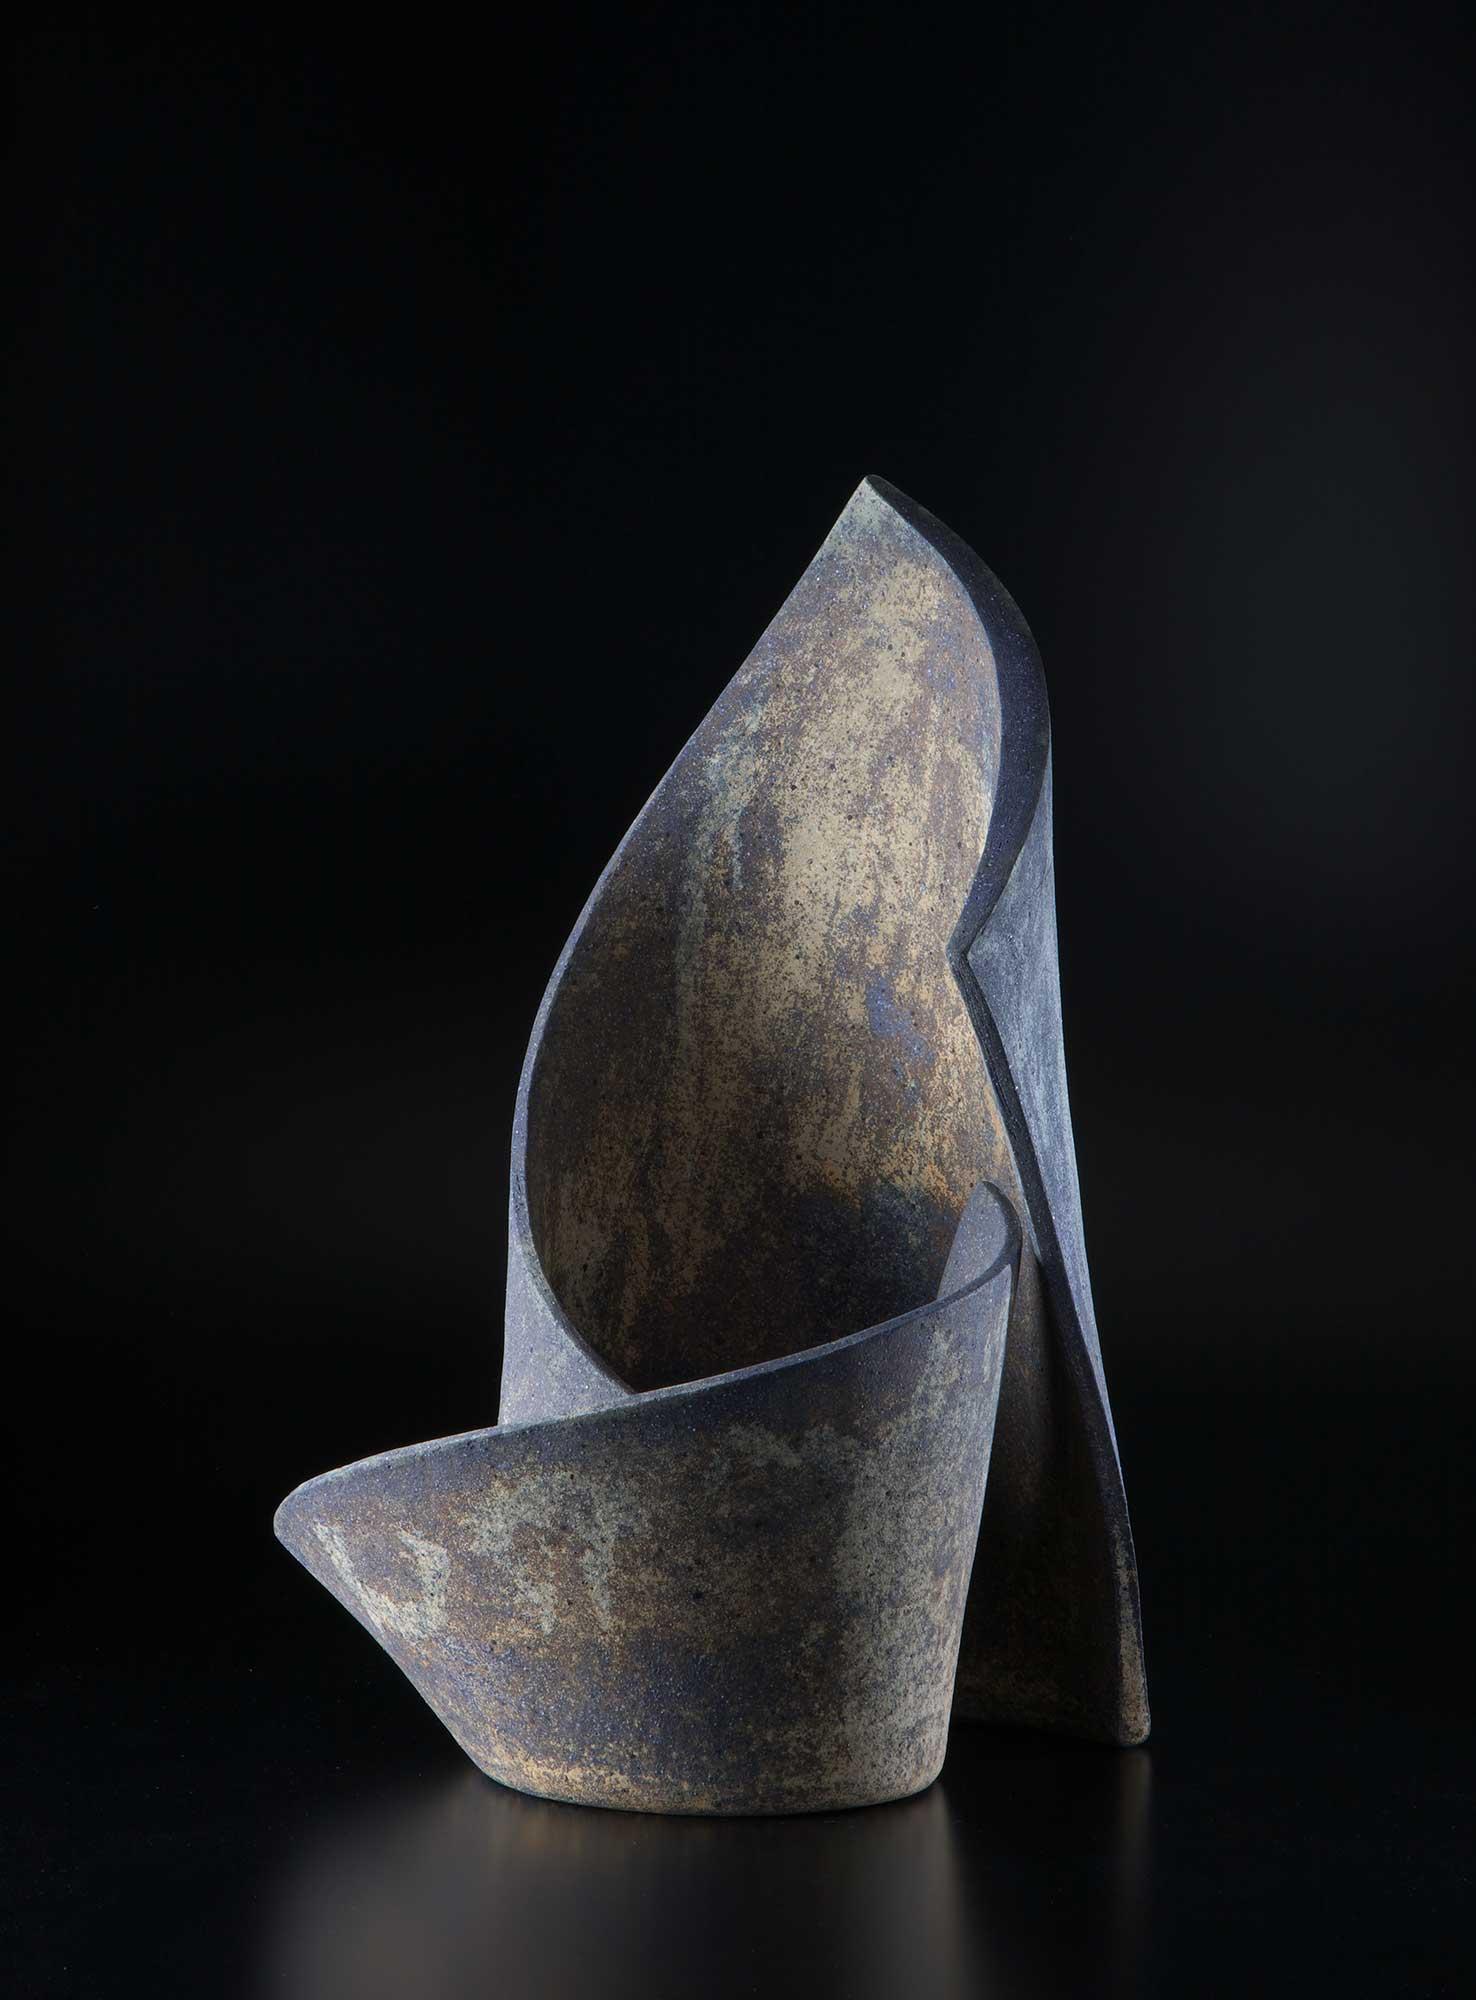 Kei (Mindscape)(2015)